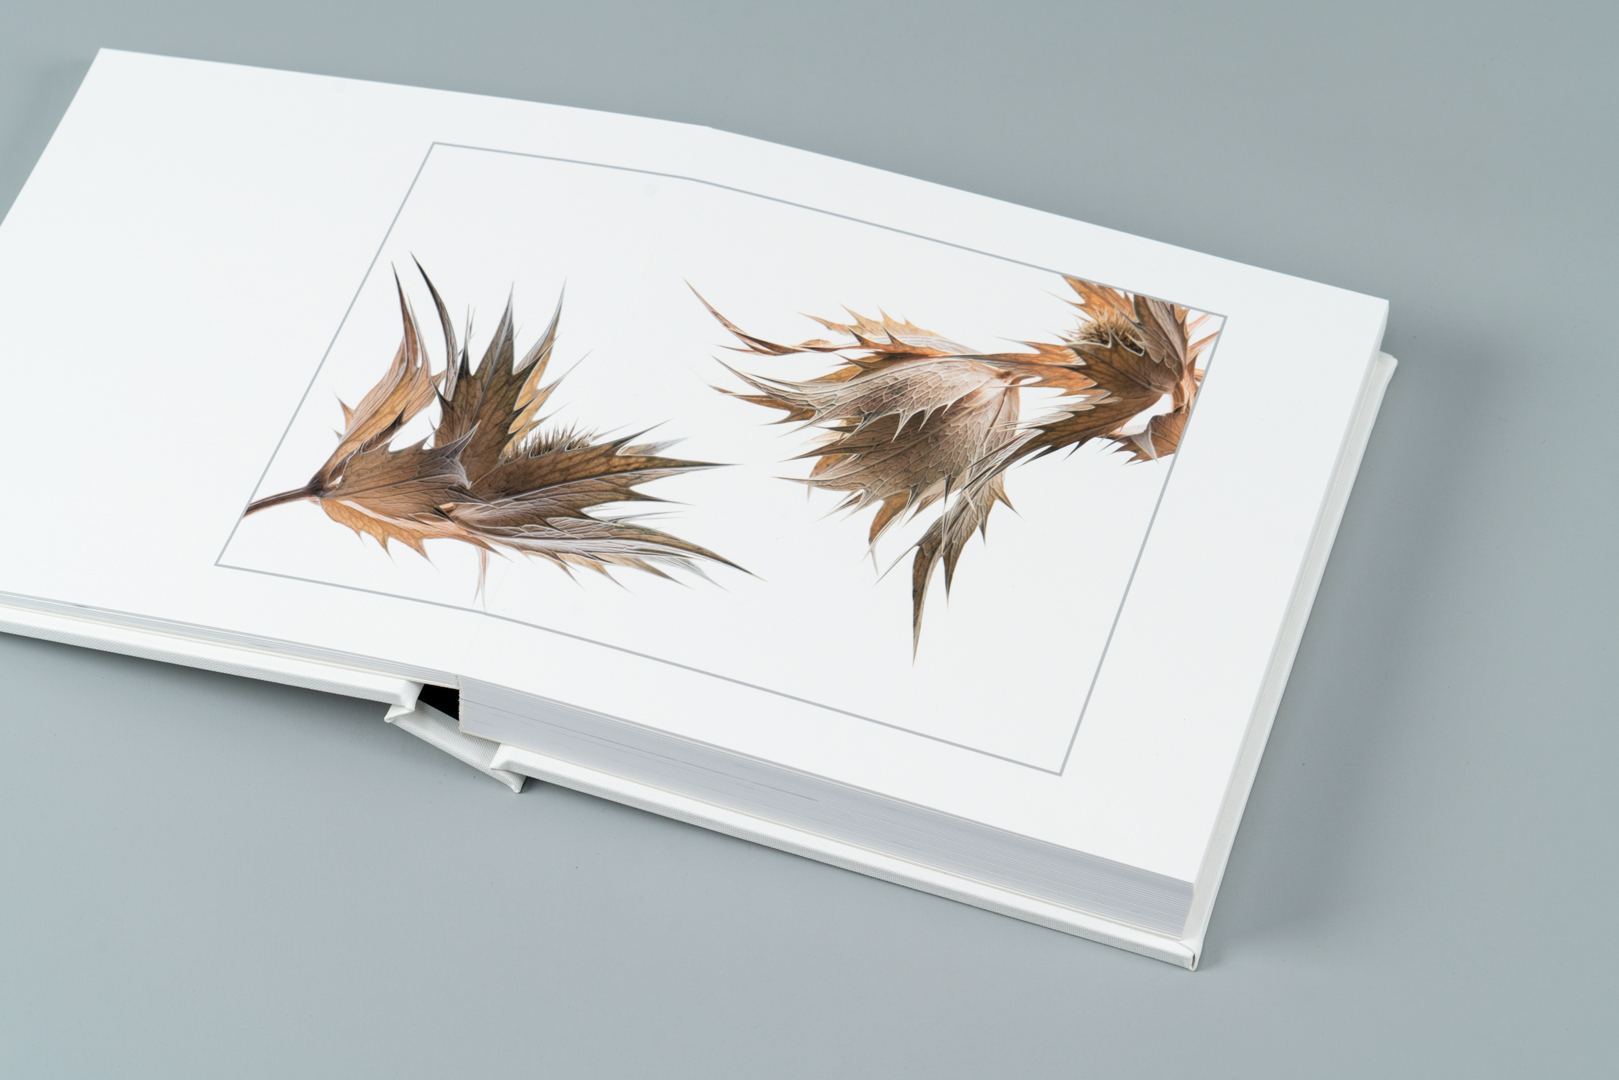 Photo books for fine art photographers